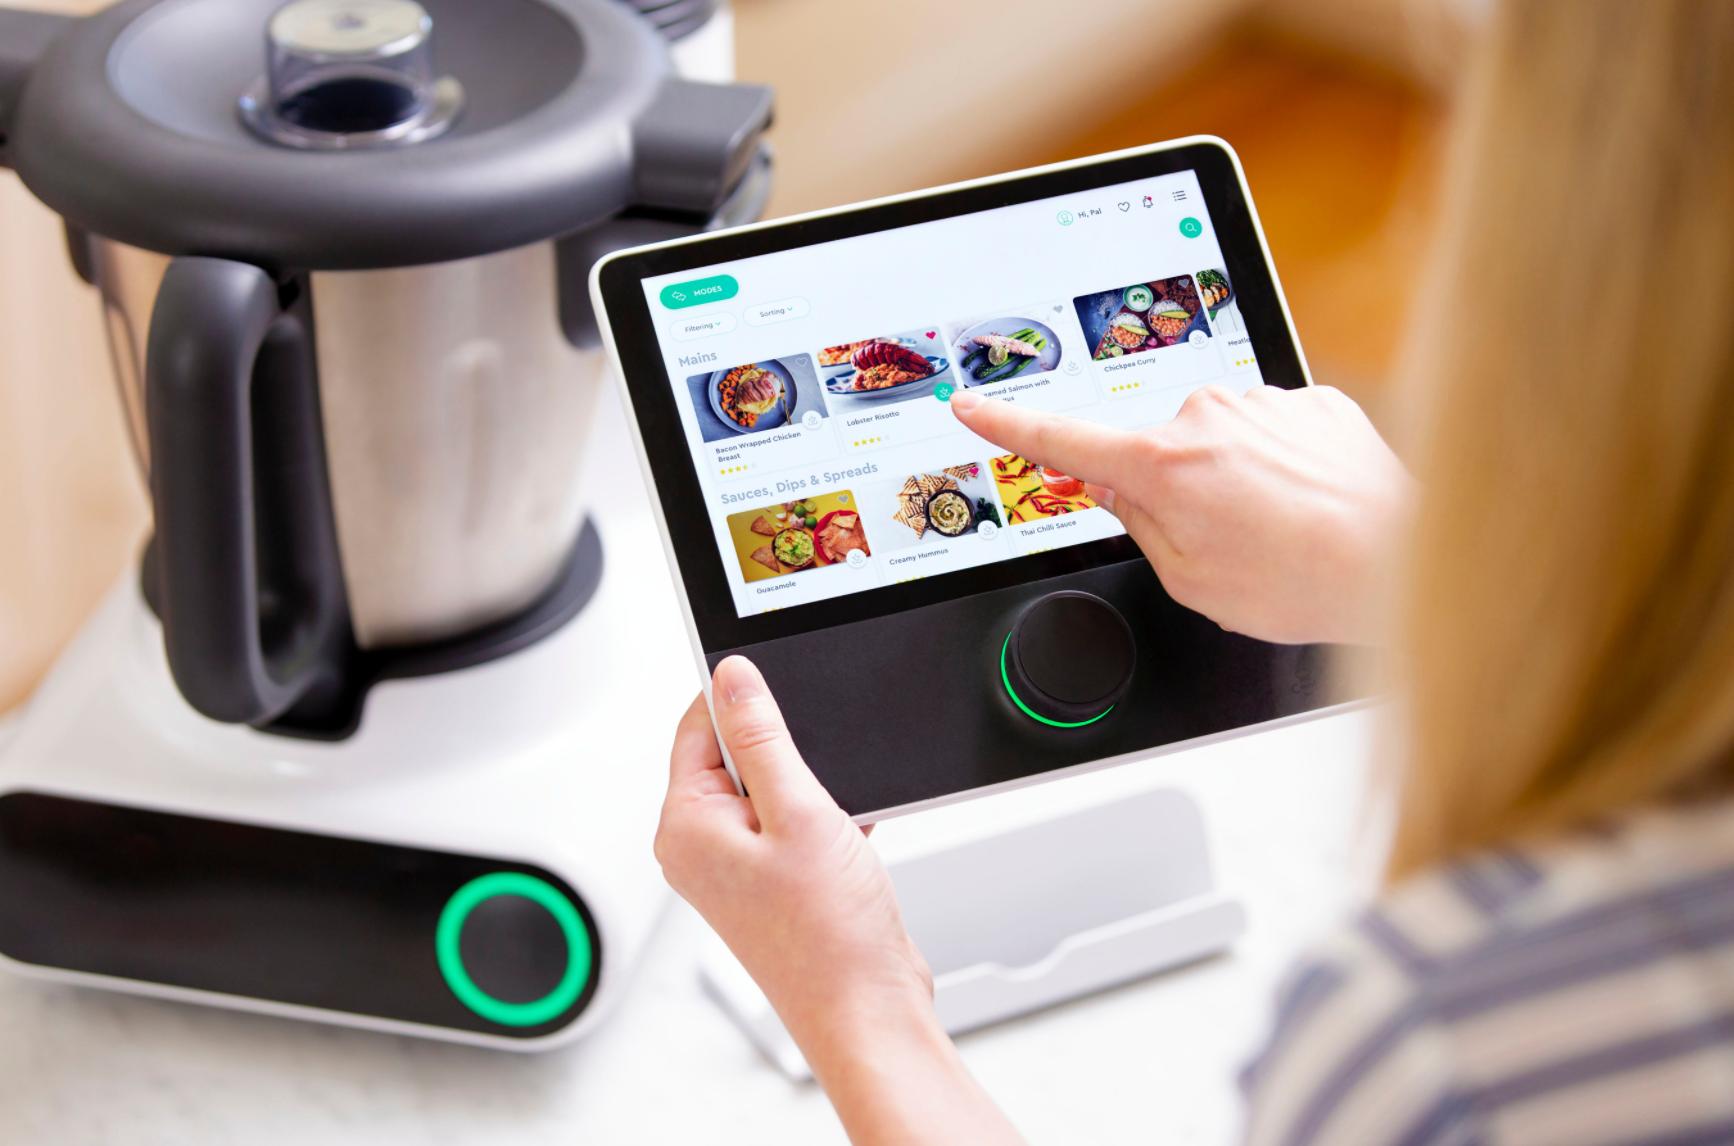 cookingpal smart kitchen hub